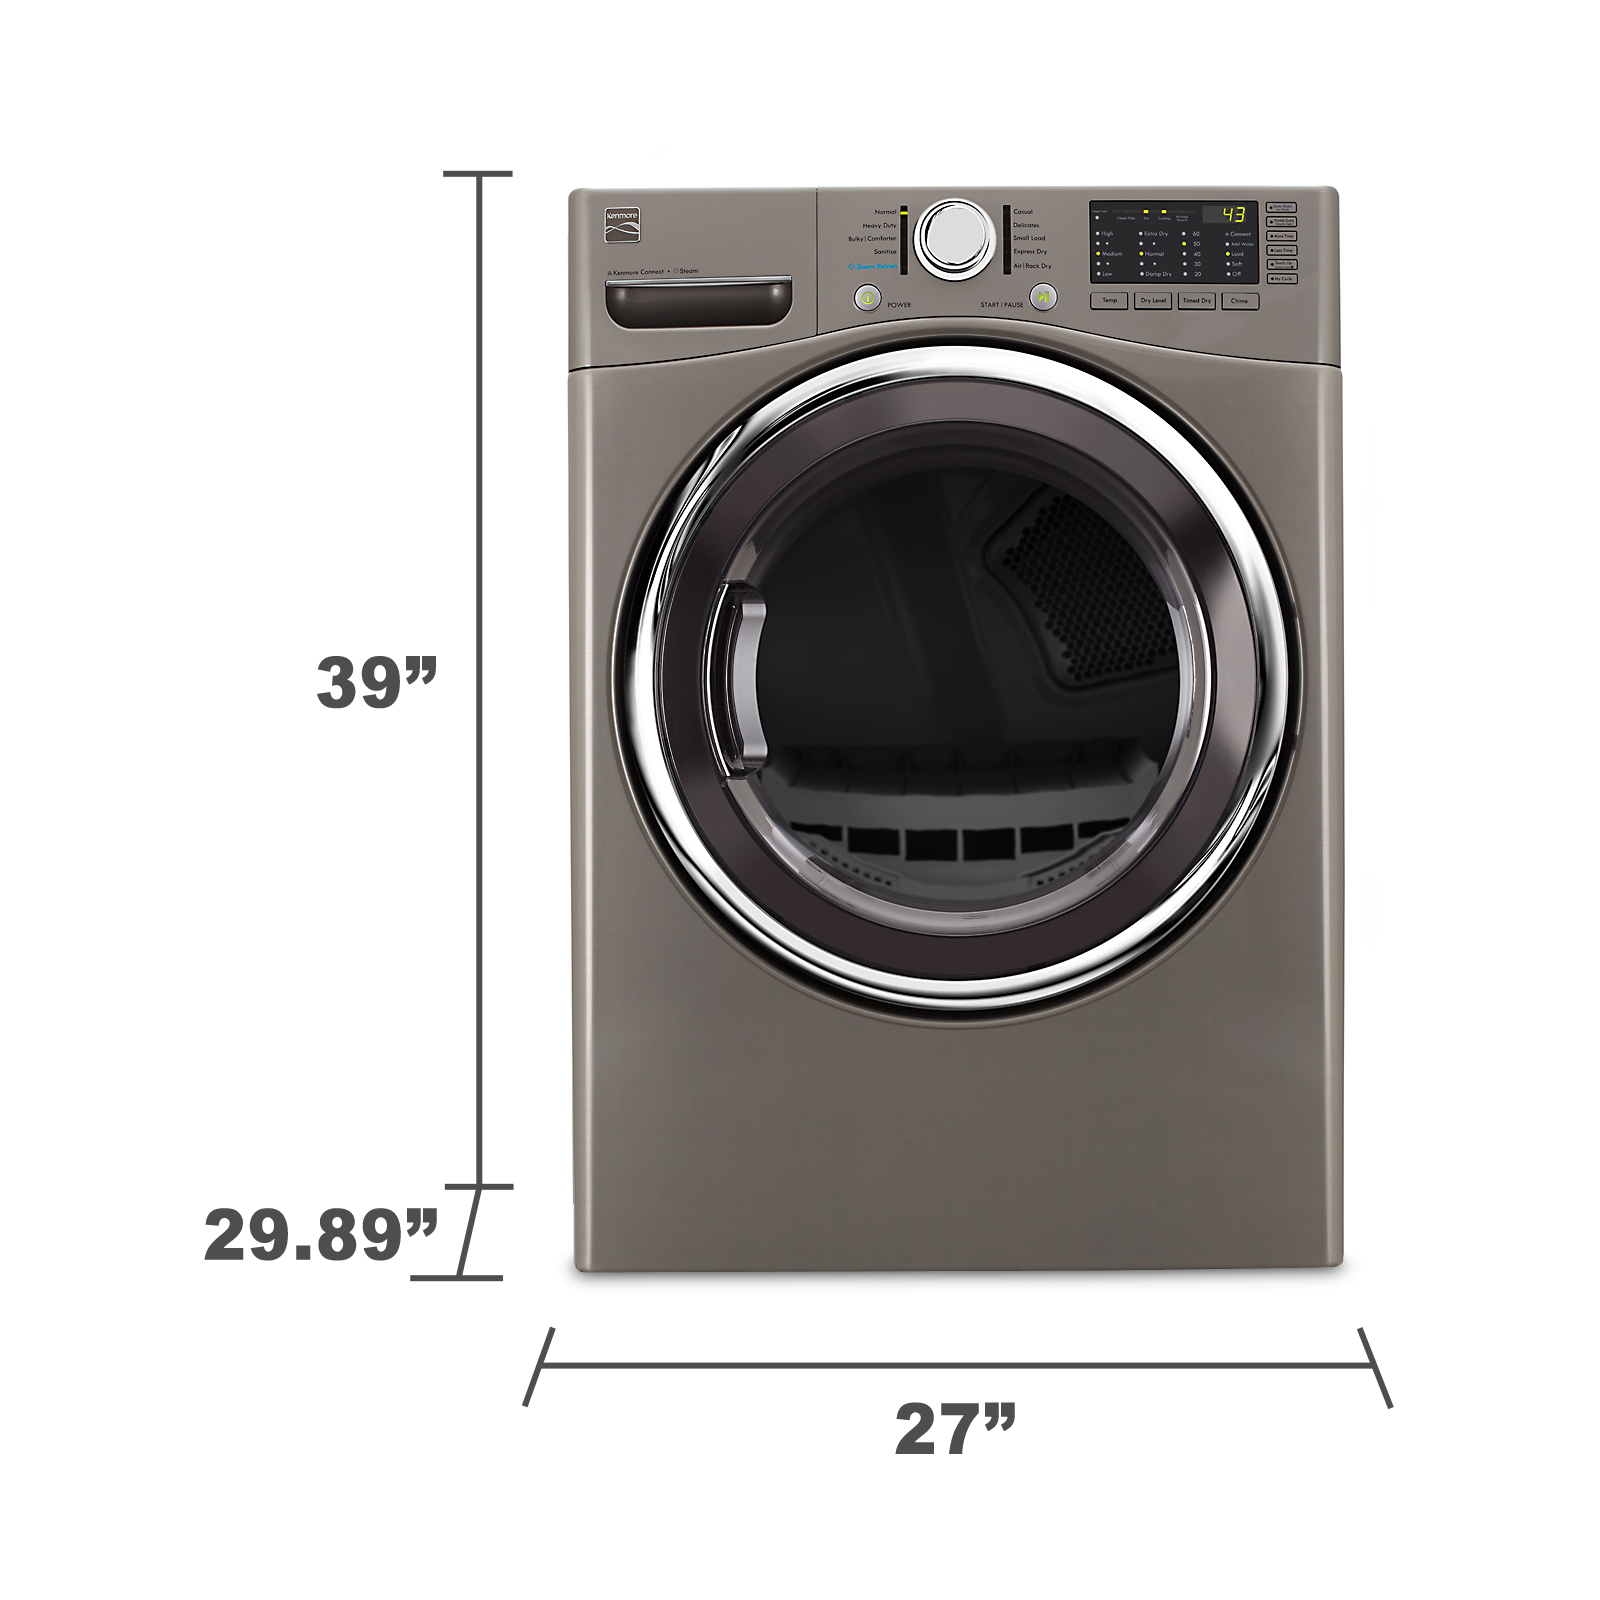 Kenmore 91383 7.4 cu. ft. Gas Dryer w/ Steam - Metallic Silver